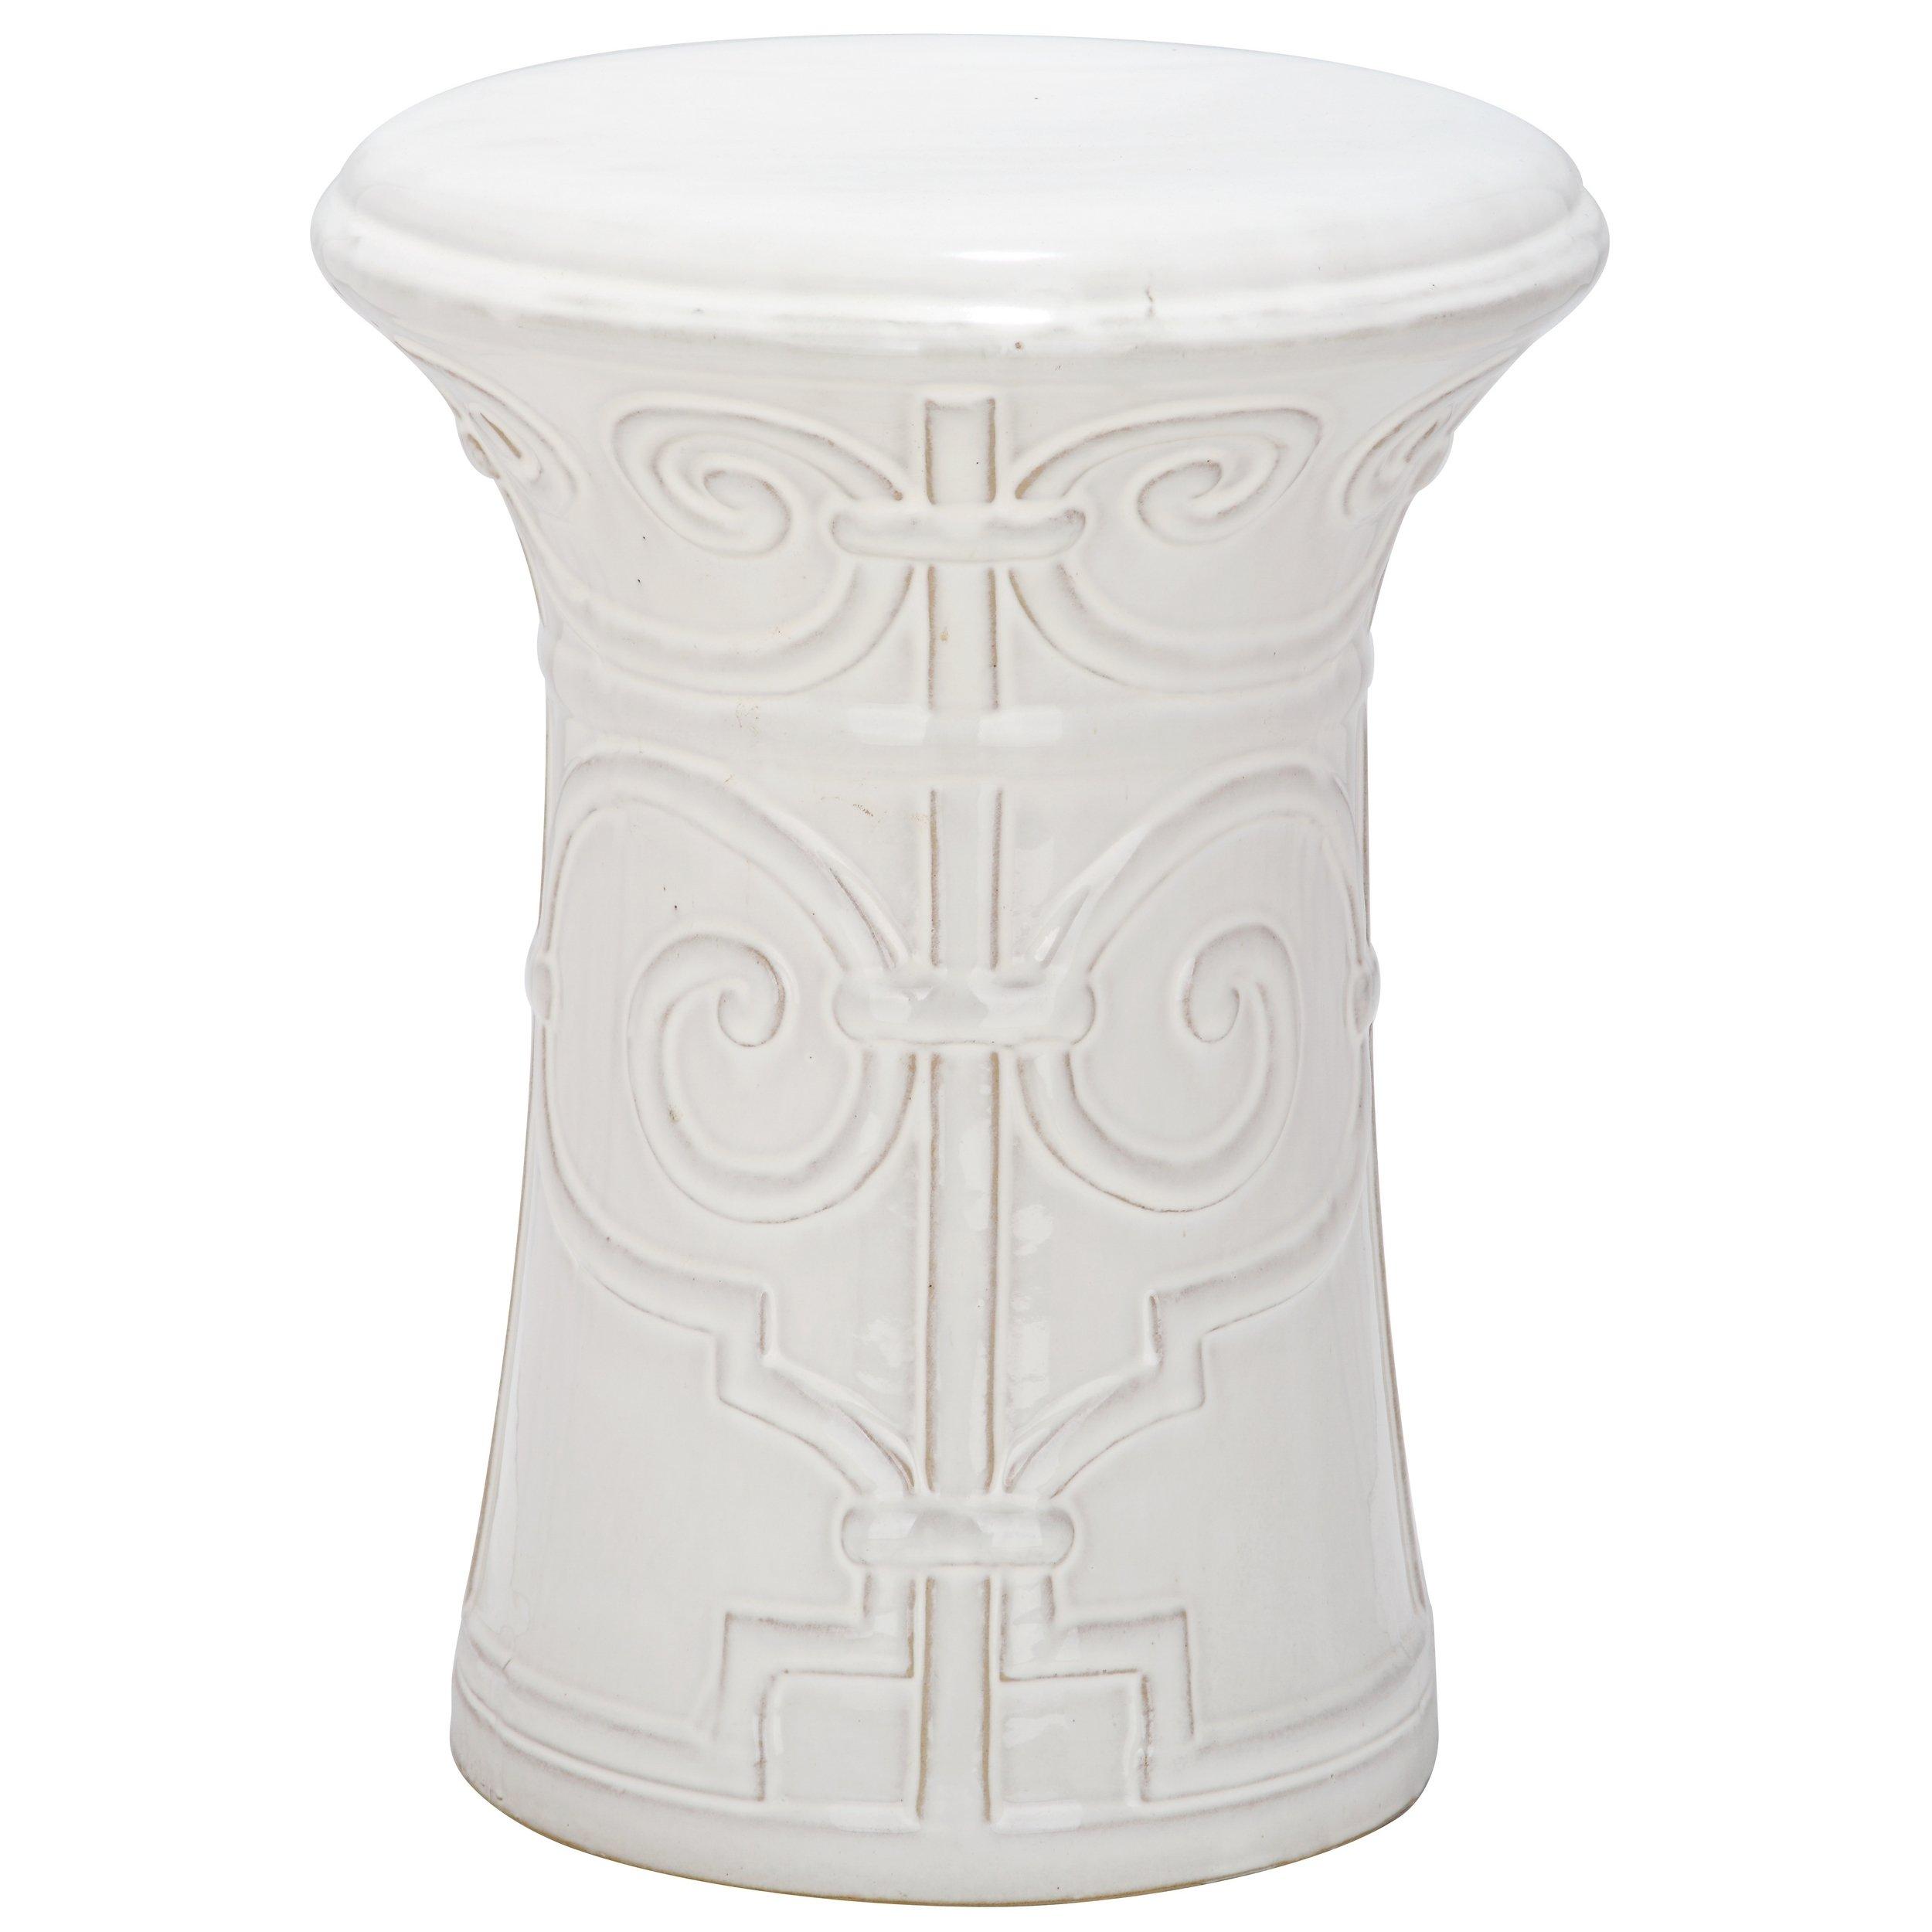 Safavieh Castle Gardens Collection Imperial Garden White Ceramic Garden Stool